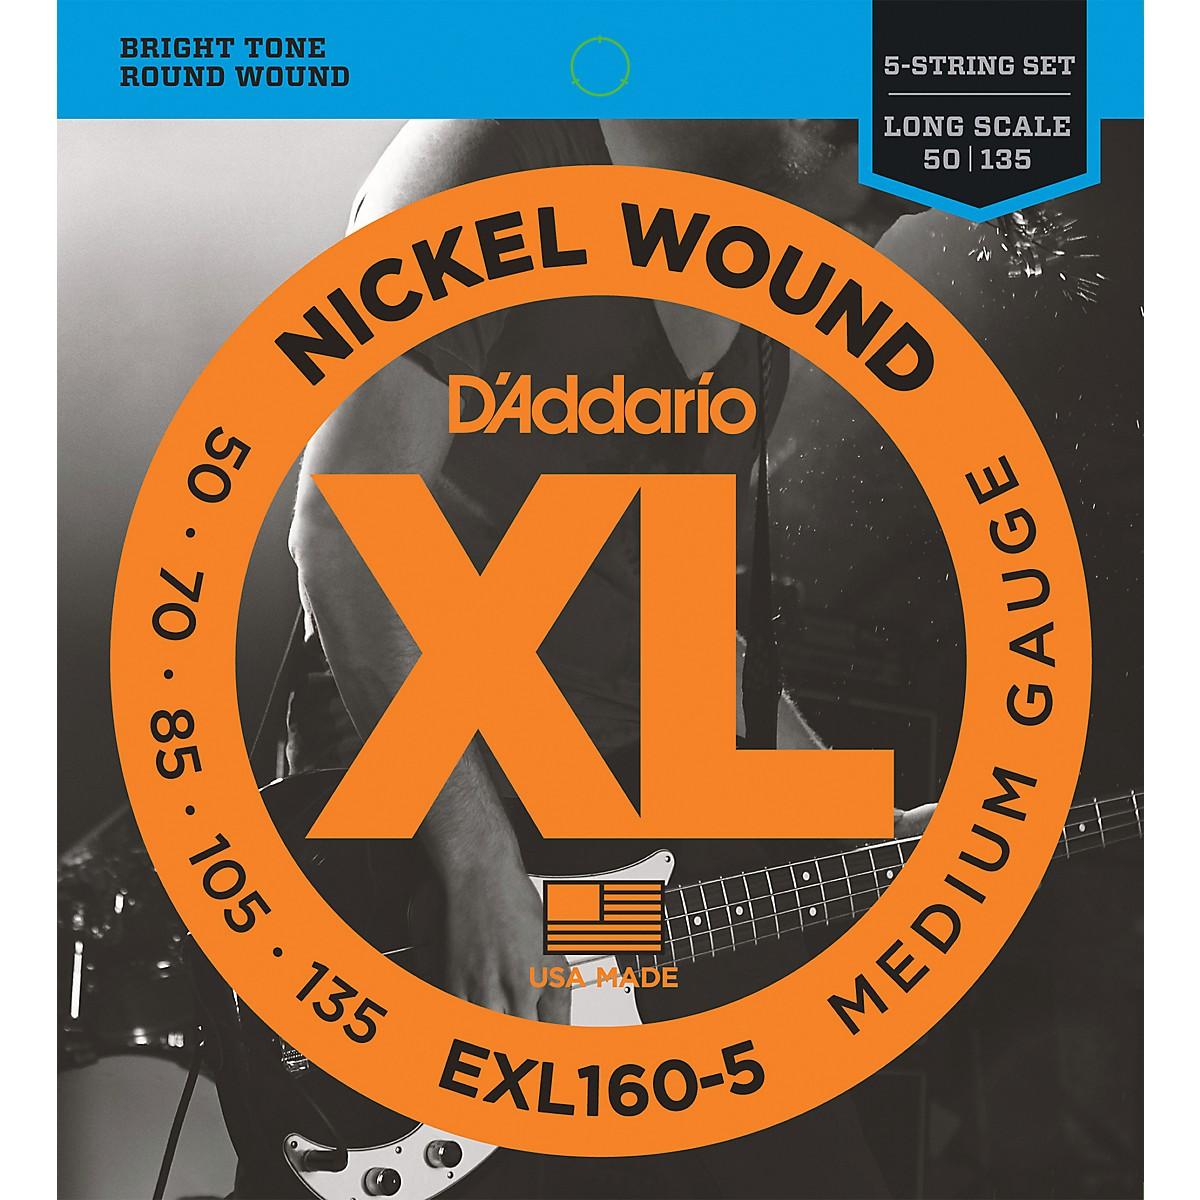 D'Addario EXL160-5 XL 5-String Bass Regular/Long String Set